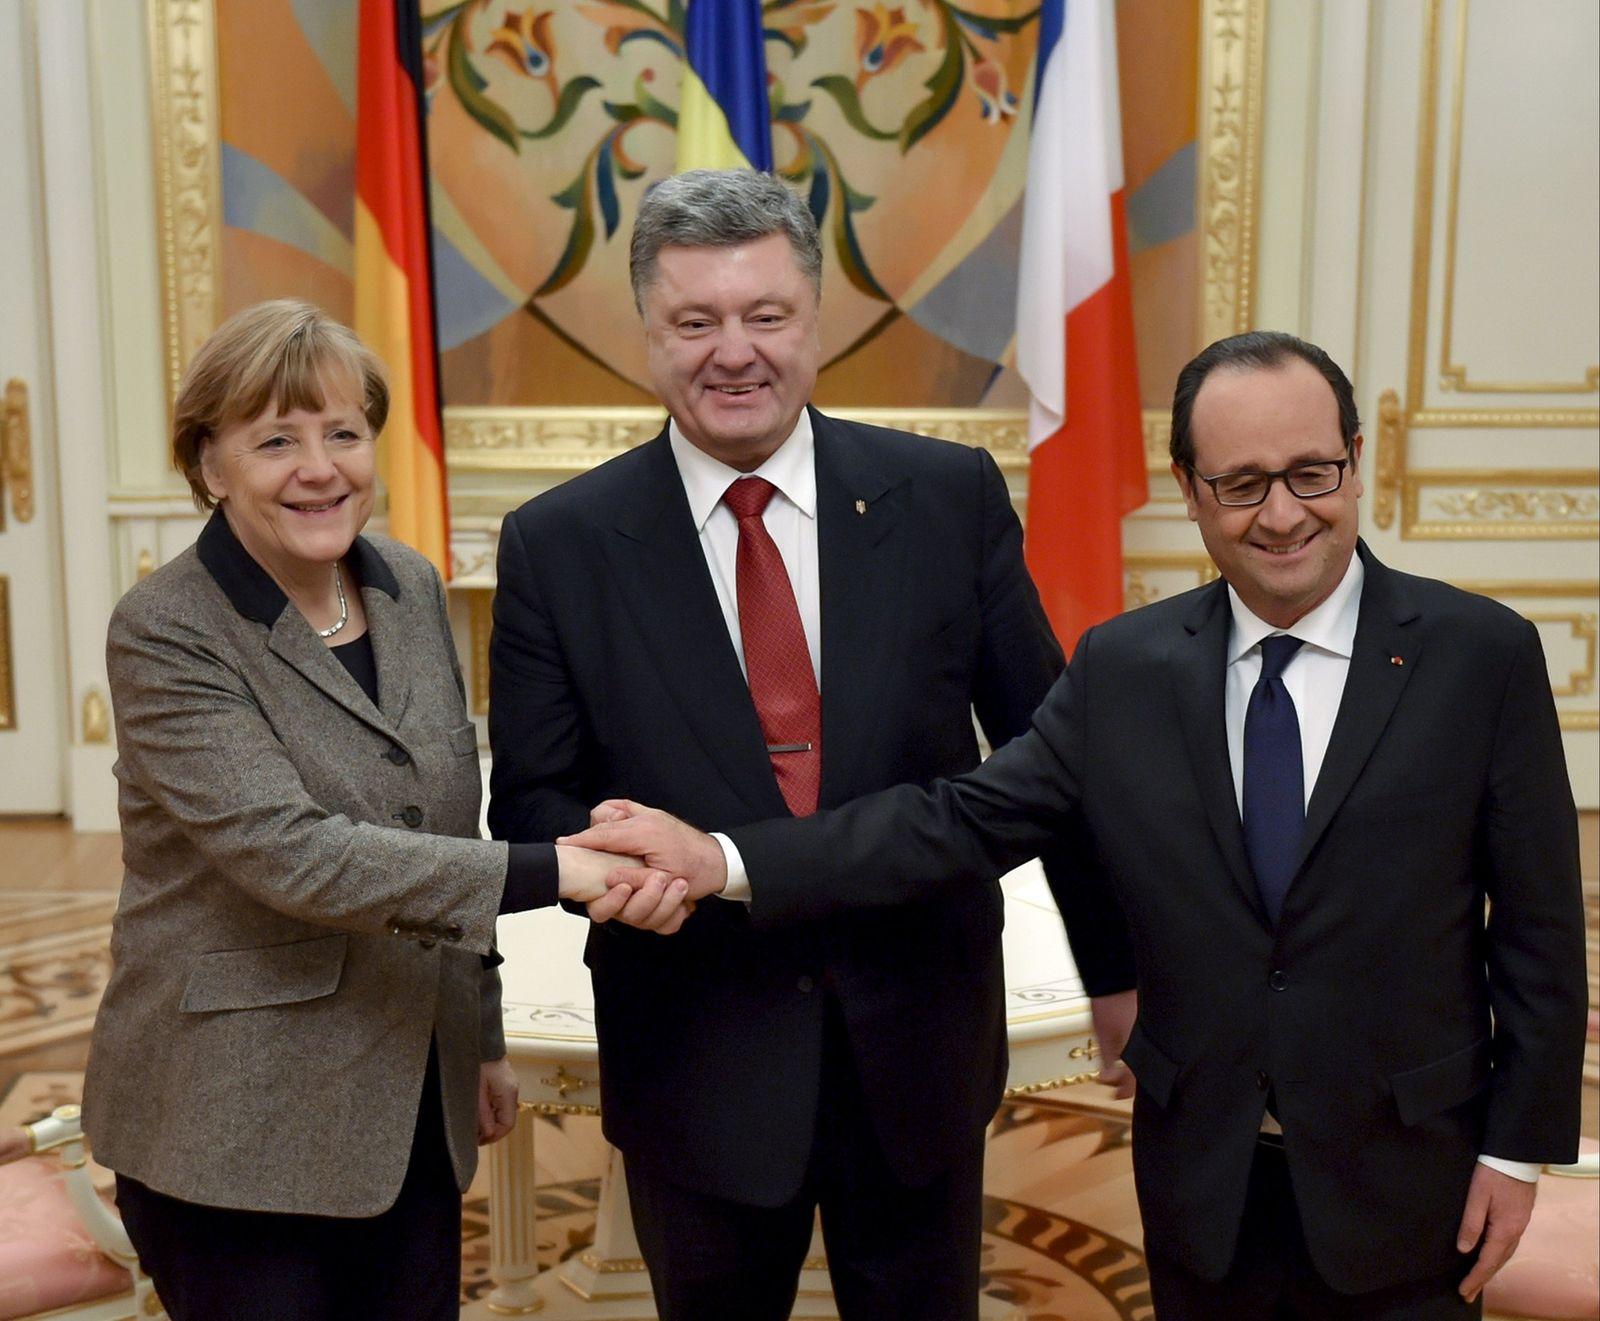 Petro Poroshenko / Francois Hollande / Angela Merkel